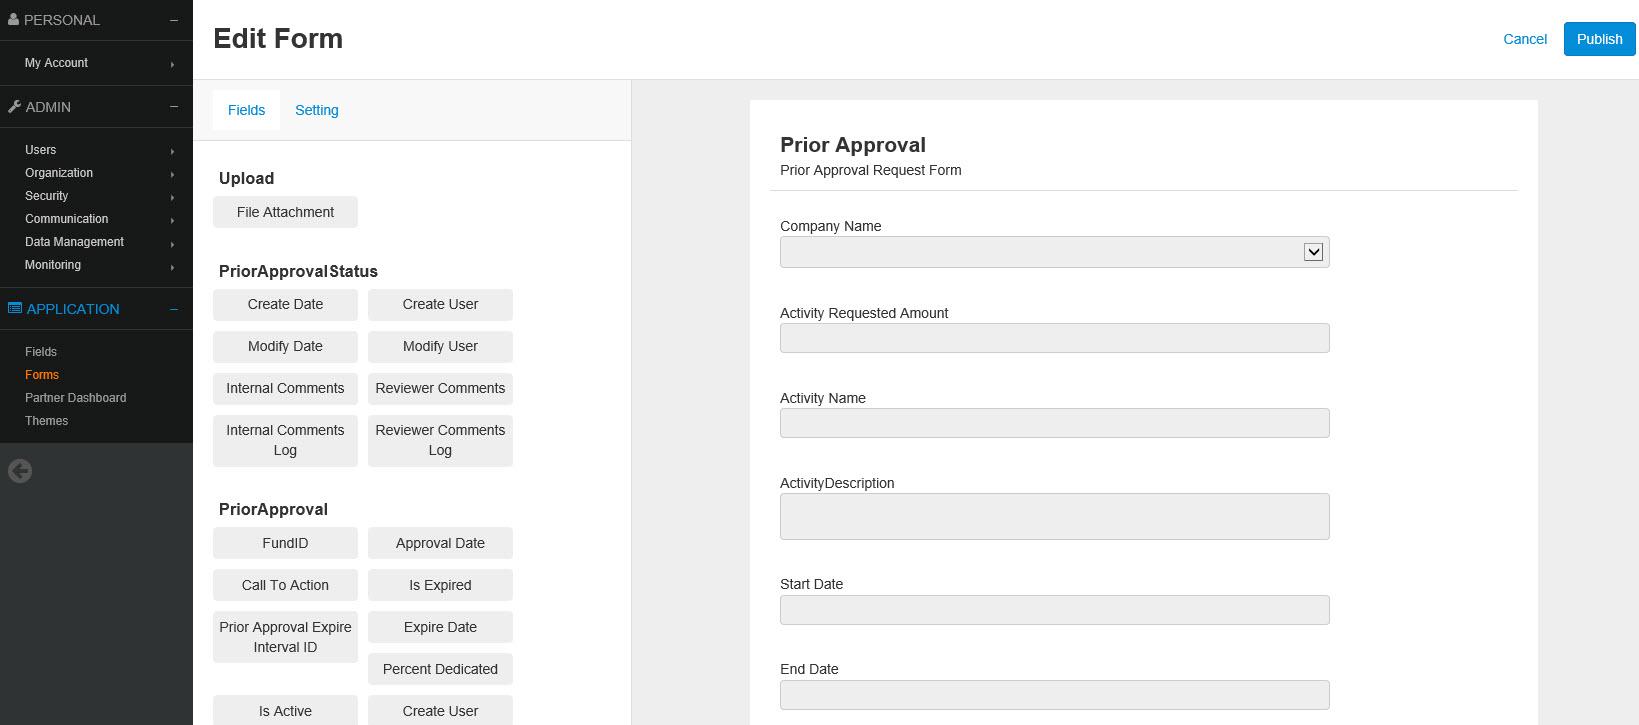 PartnerPortal Demo - Form Editor